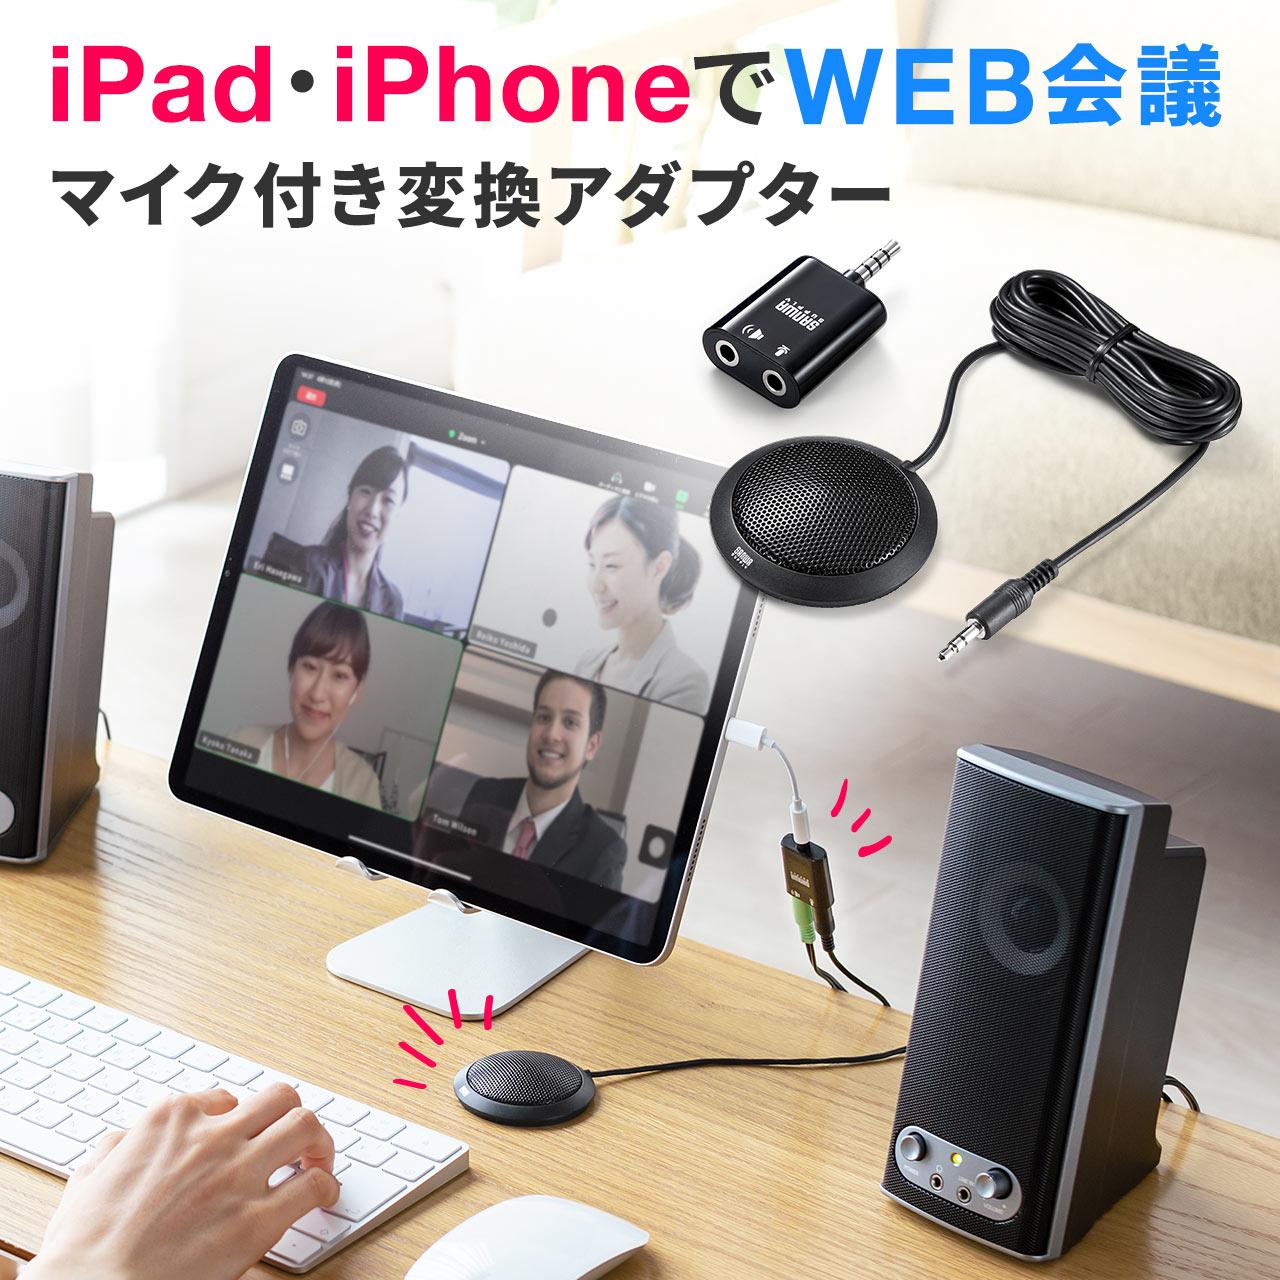 iPhone・iPad向けWEB会議用マイクアダプタ 音声分配 Skype・FaceTime対応 WEB会議マイク iPhoneSE/6/6Plus対応 [400-MC008] 【サンワダイレクト限定品】